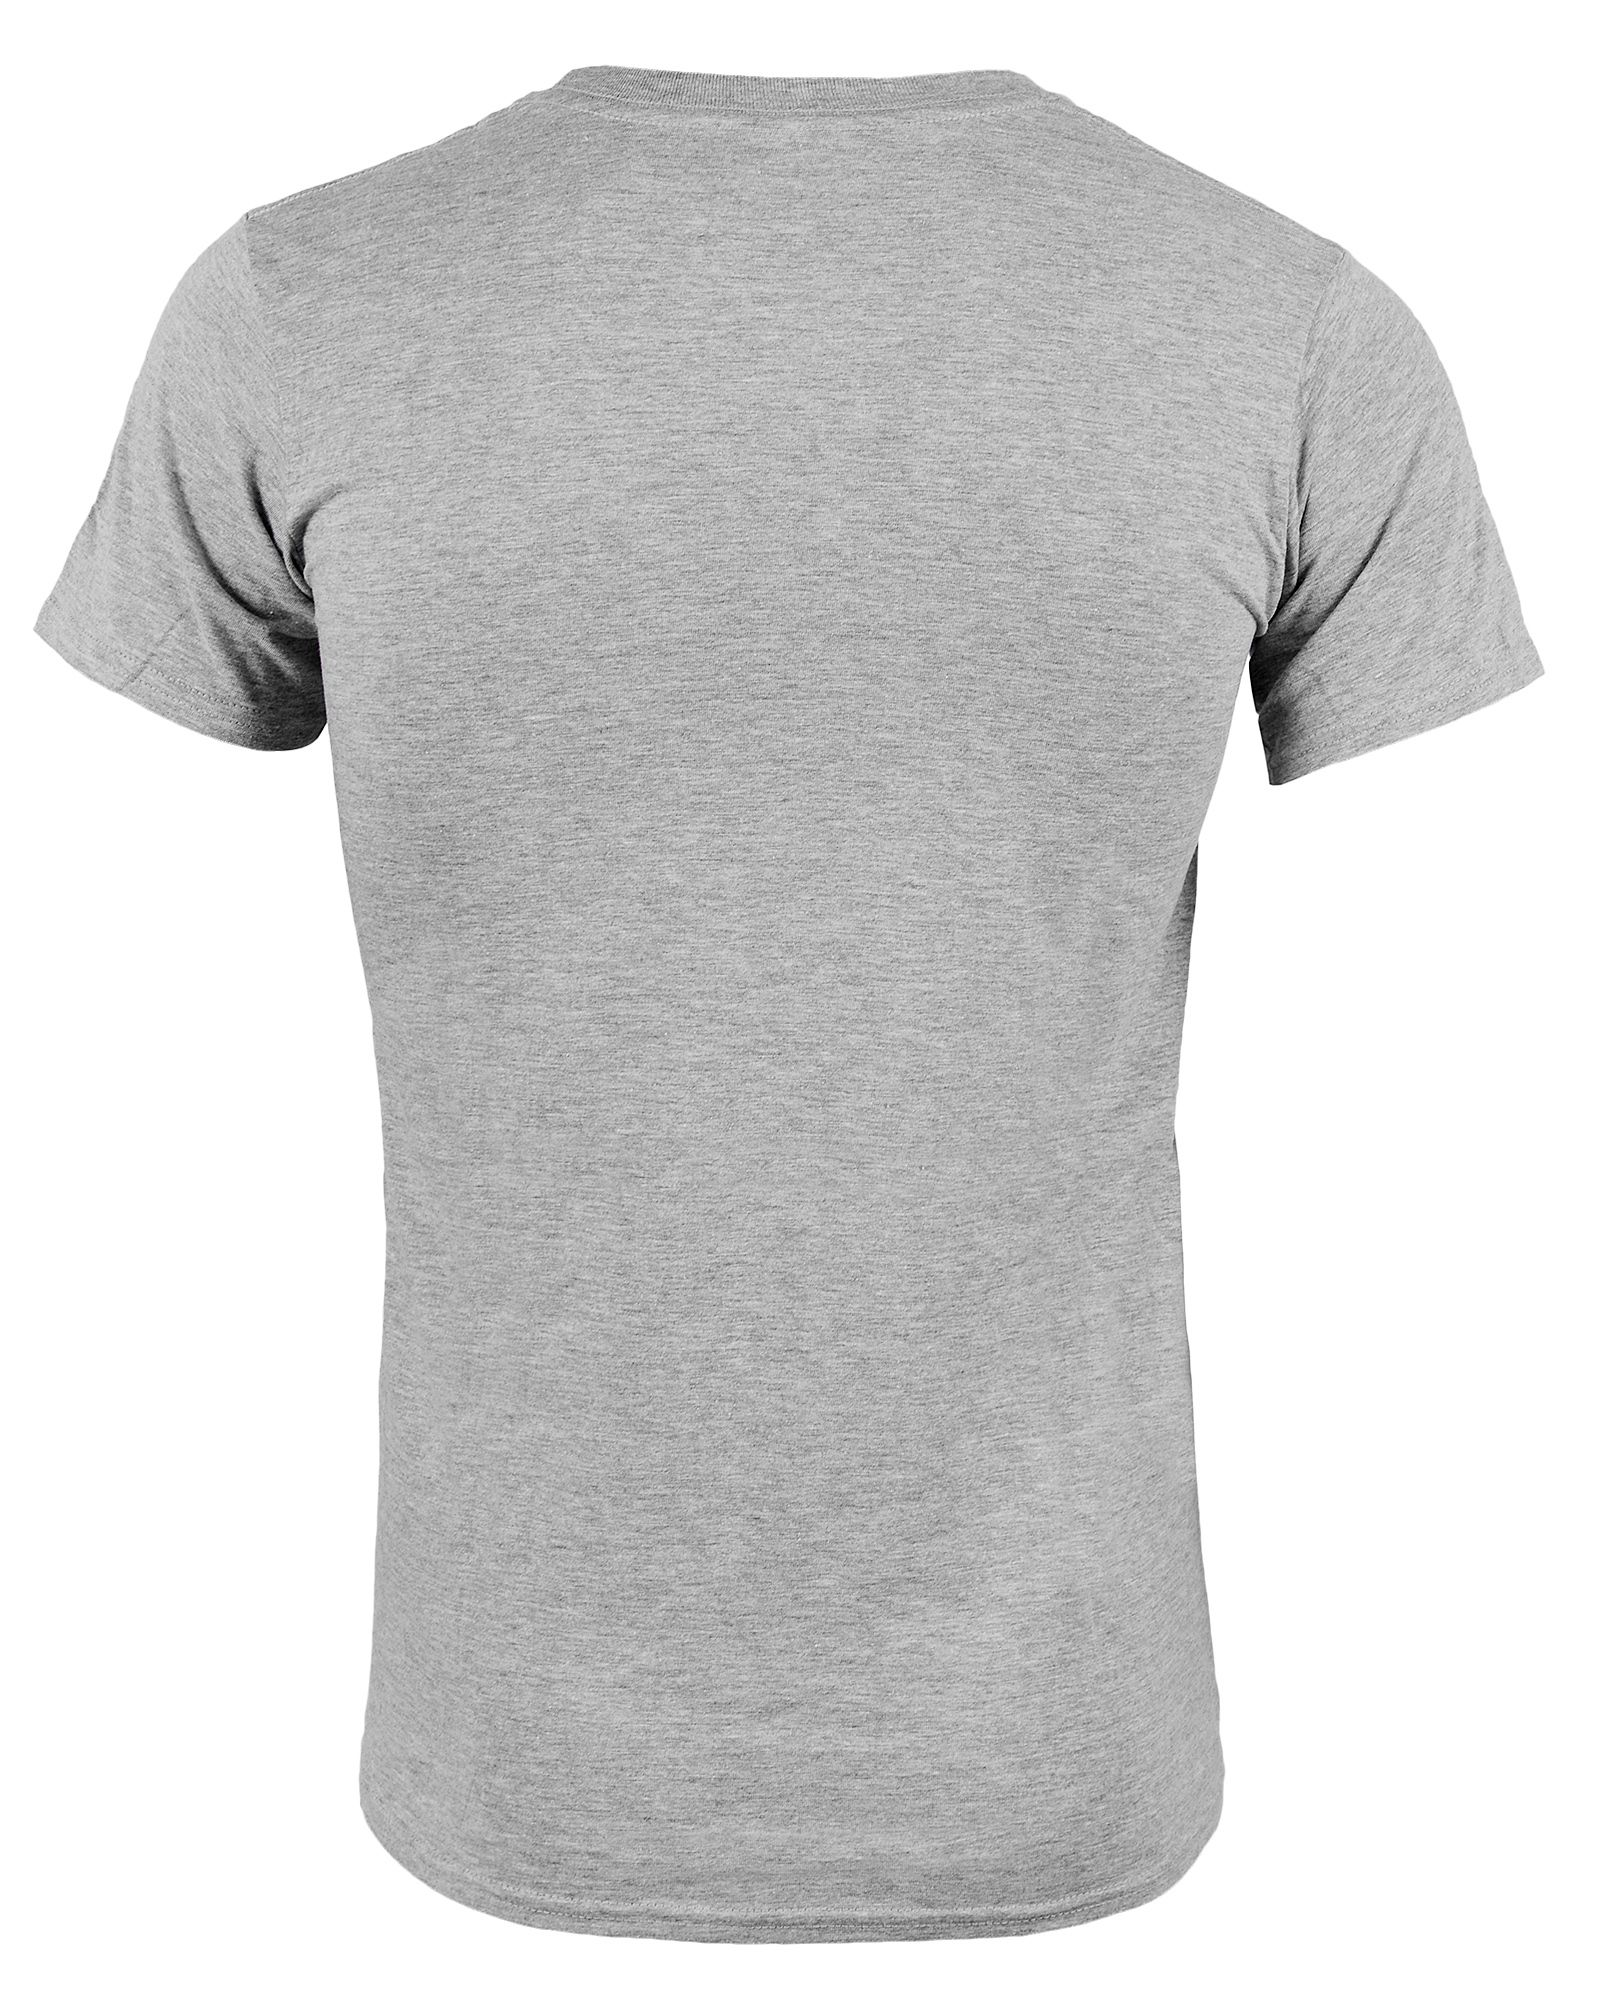 Тениска Micky Mouse - Tap, сива, размер L - 2